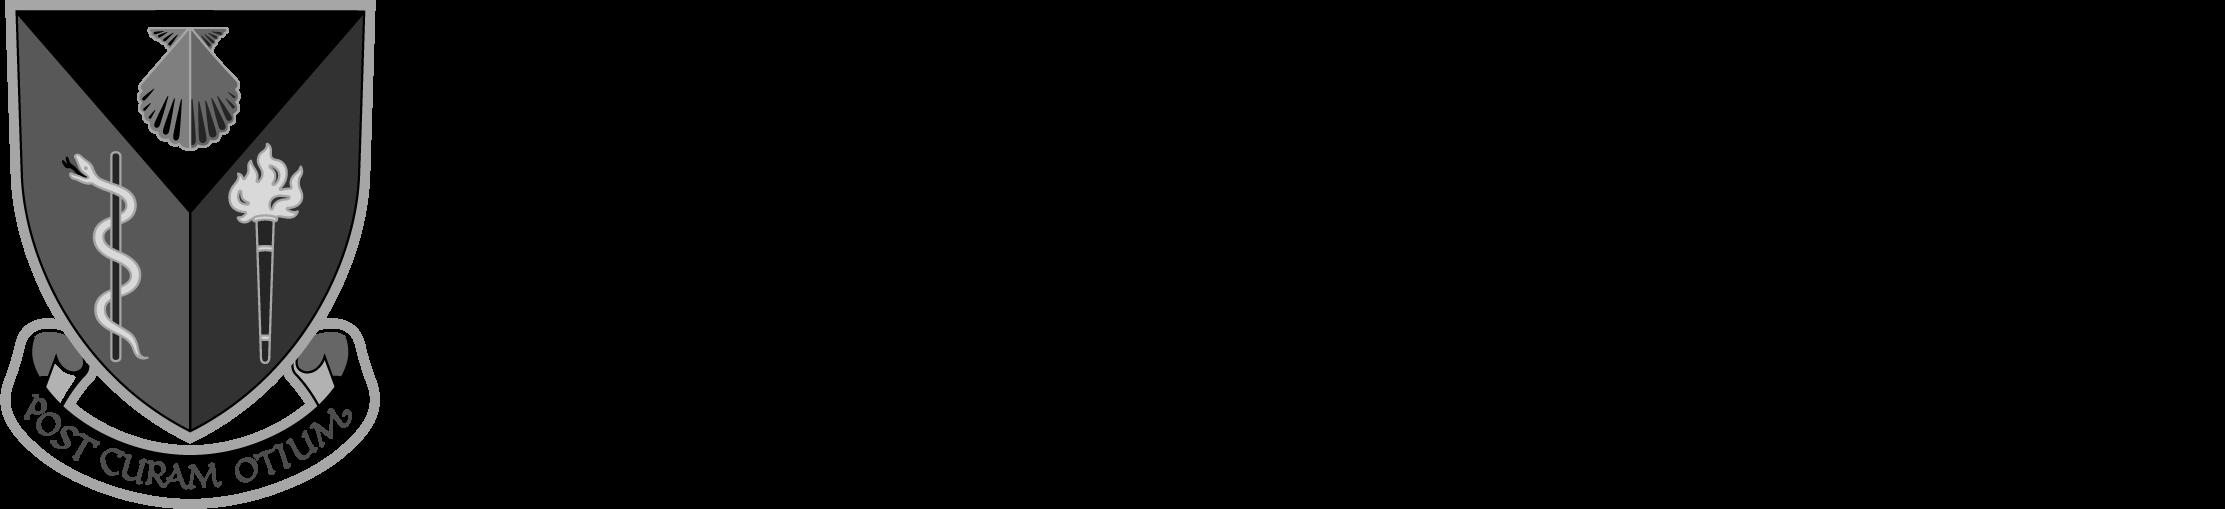 Royal Collage of Podiarty logo